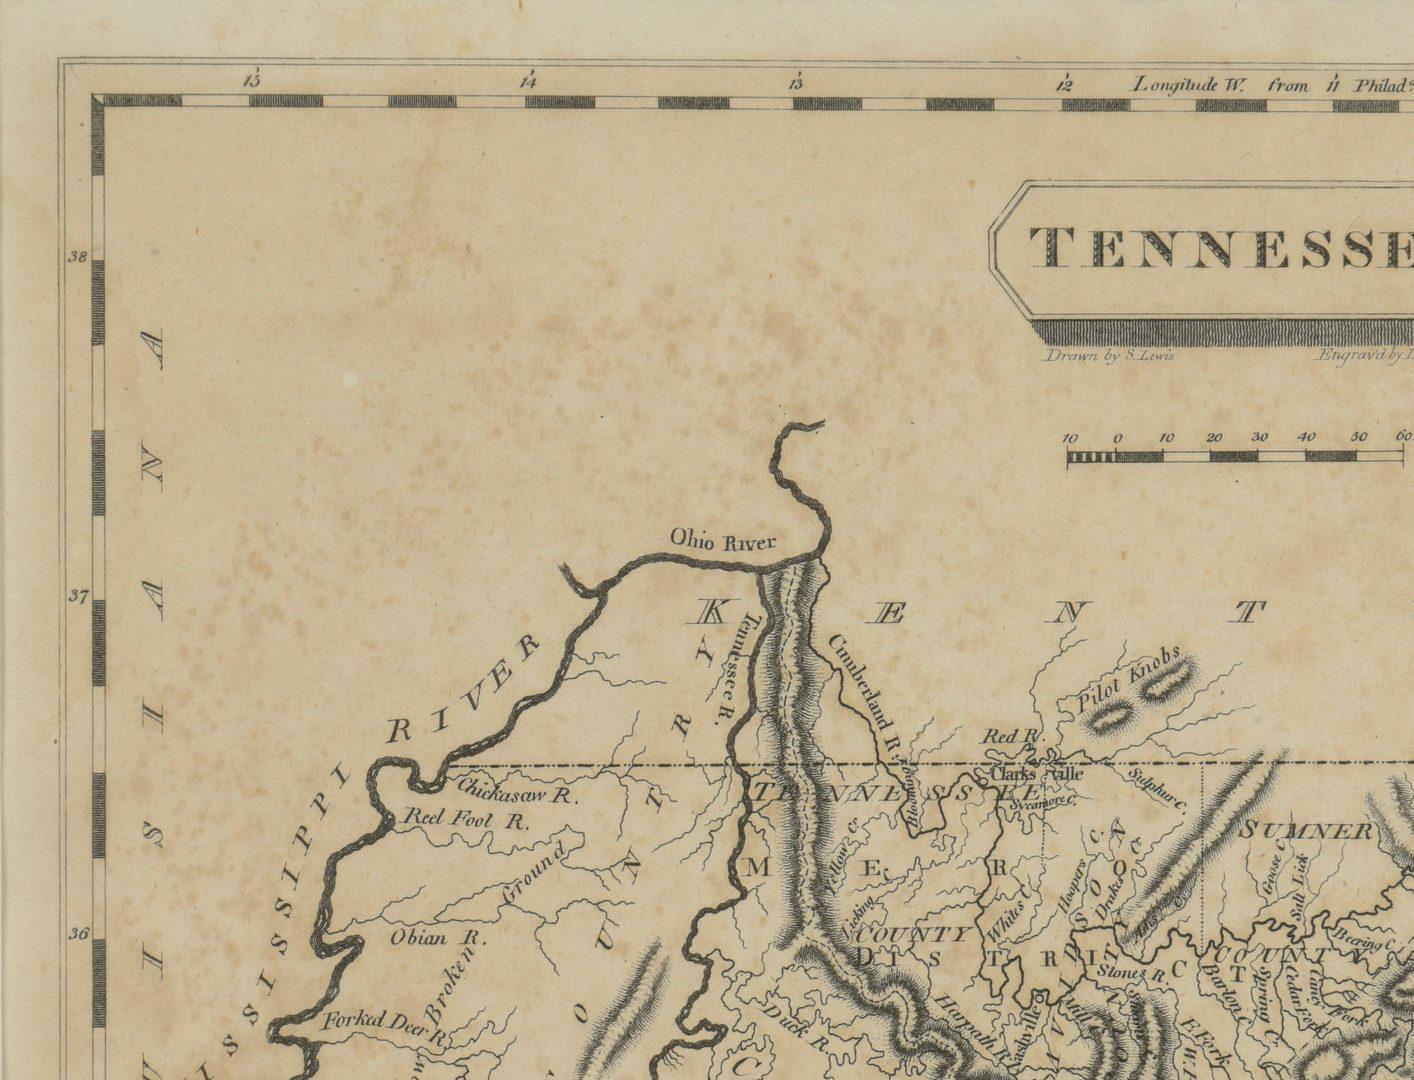 Lot 264: Tennessee Map, Samuel Lewis & Alexander Lawson, 1804